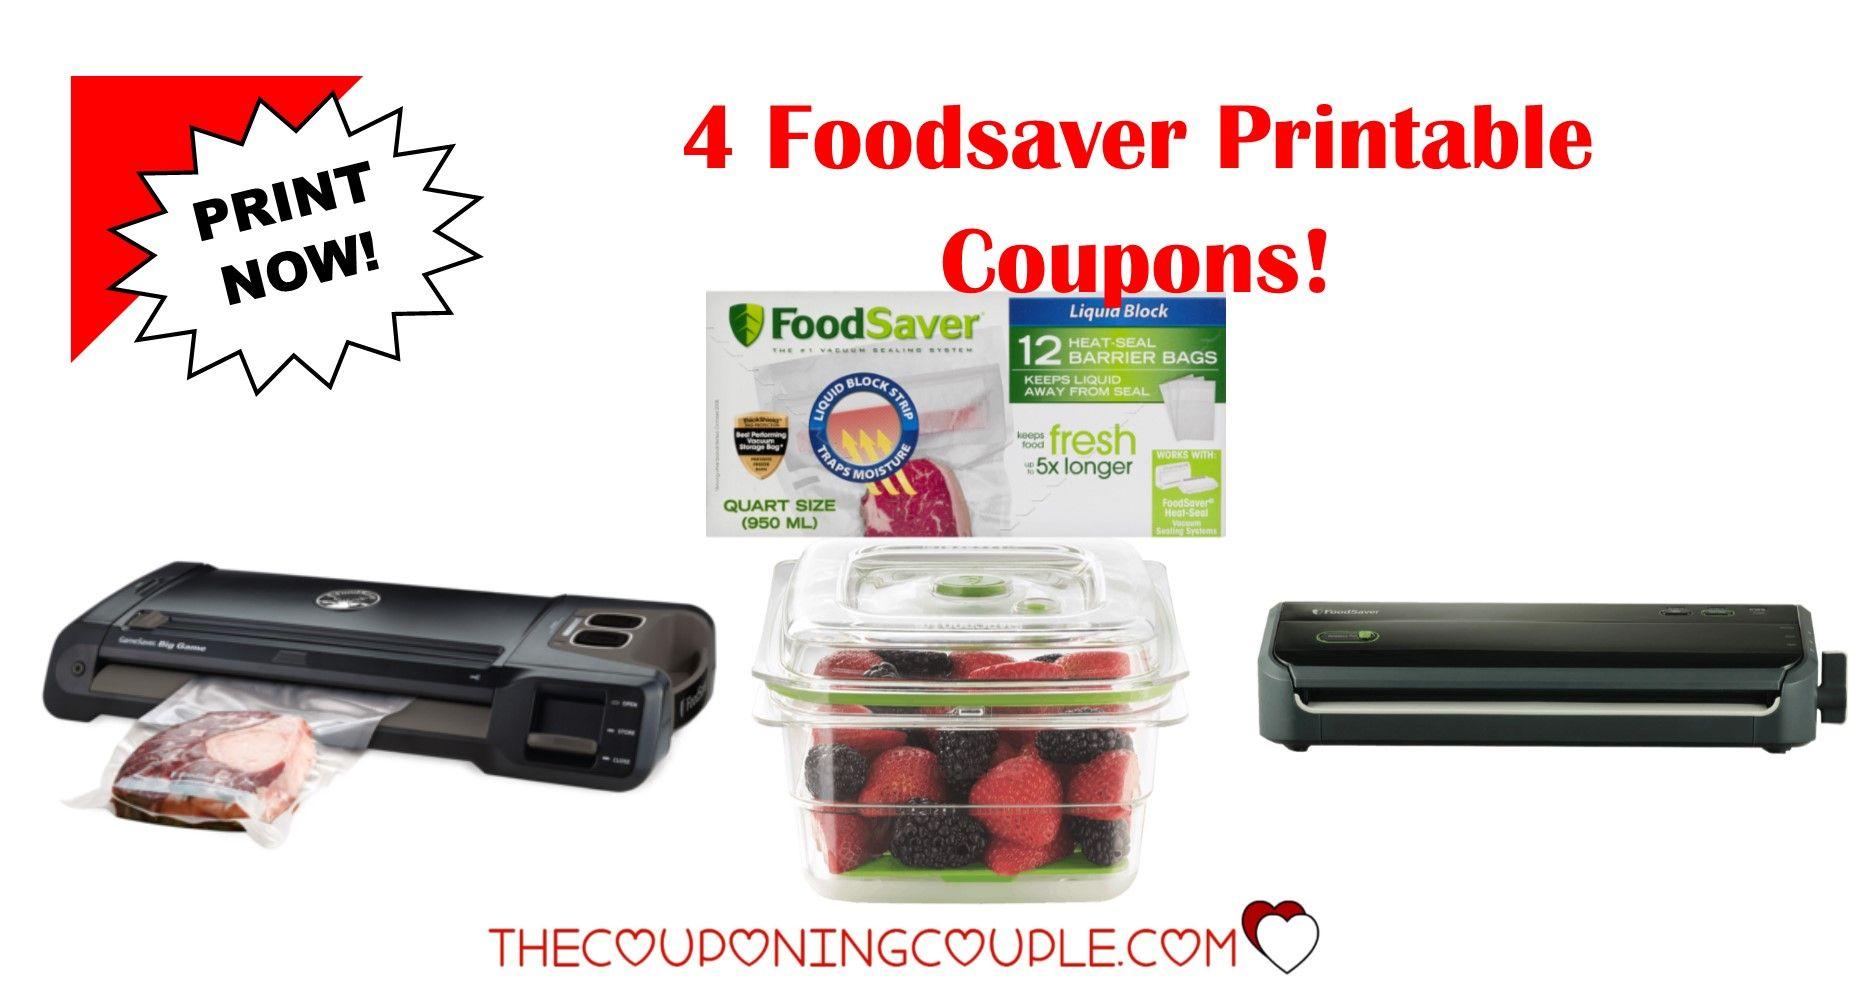 2 Foodsaver Printable Coupons 24 In Savings Print Now